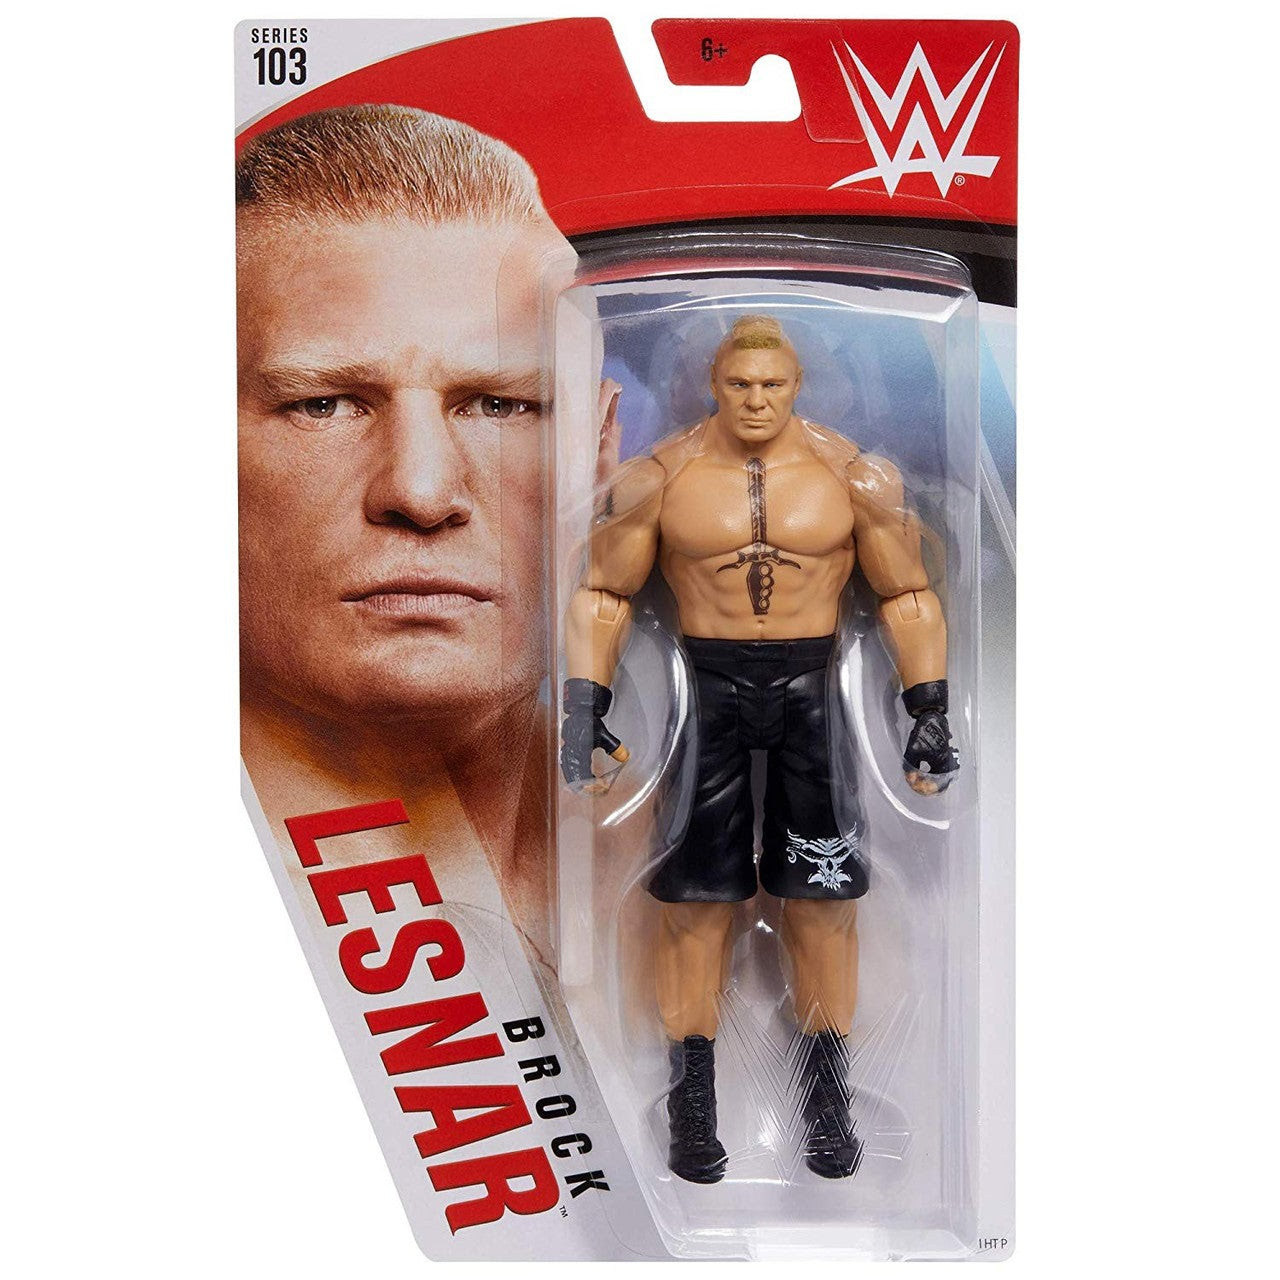 Image of WWE Basic Figure Series 103 - Brock Lesnar